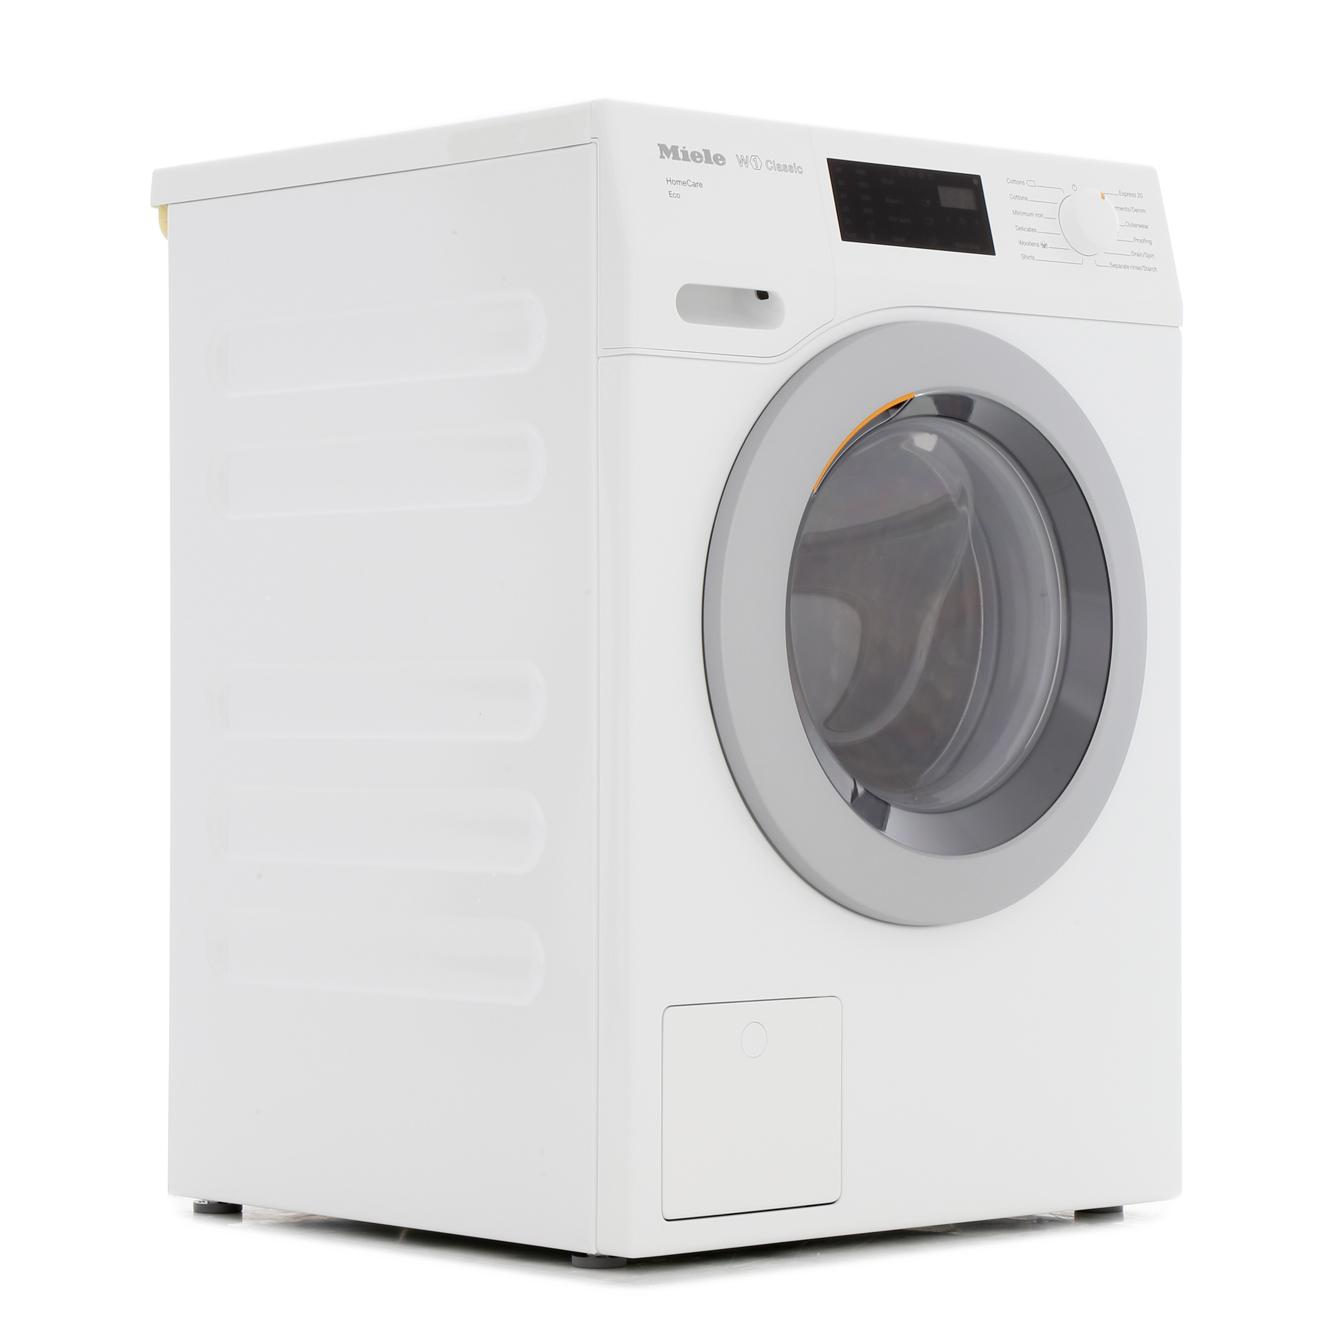 Miele W1 - Classic WDB036 Eco HomeCare White Washing Machine